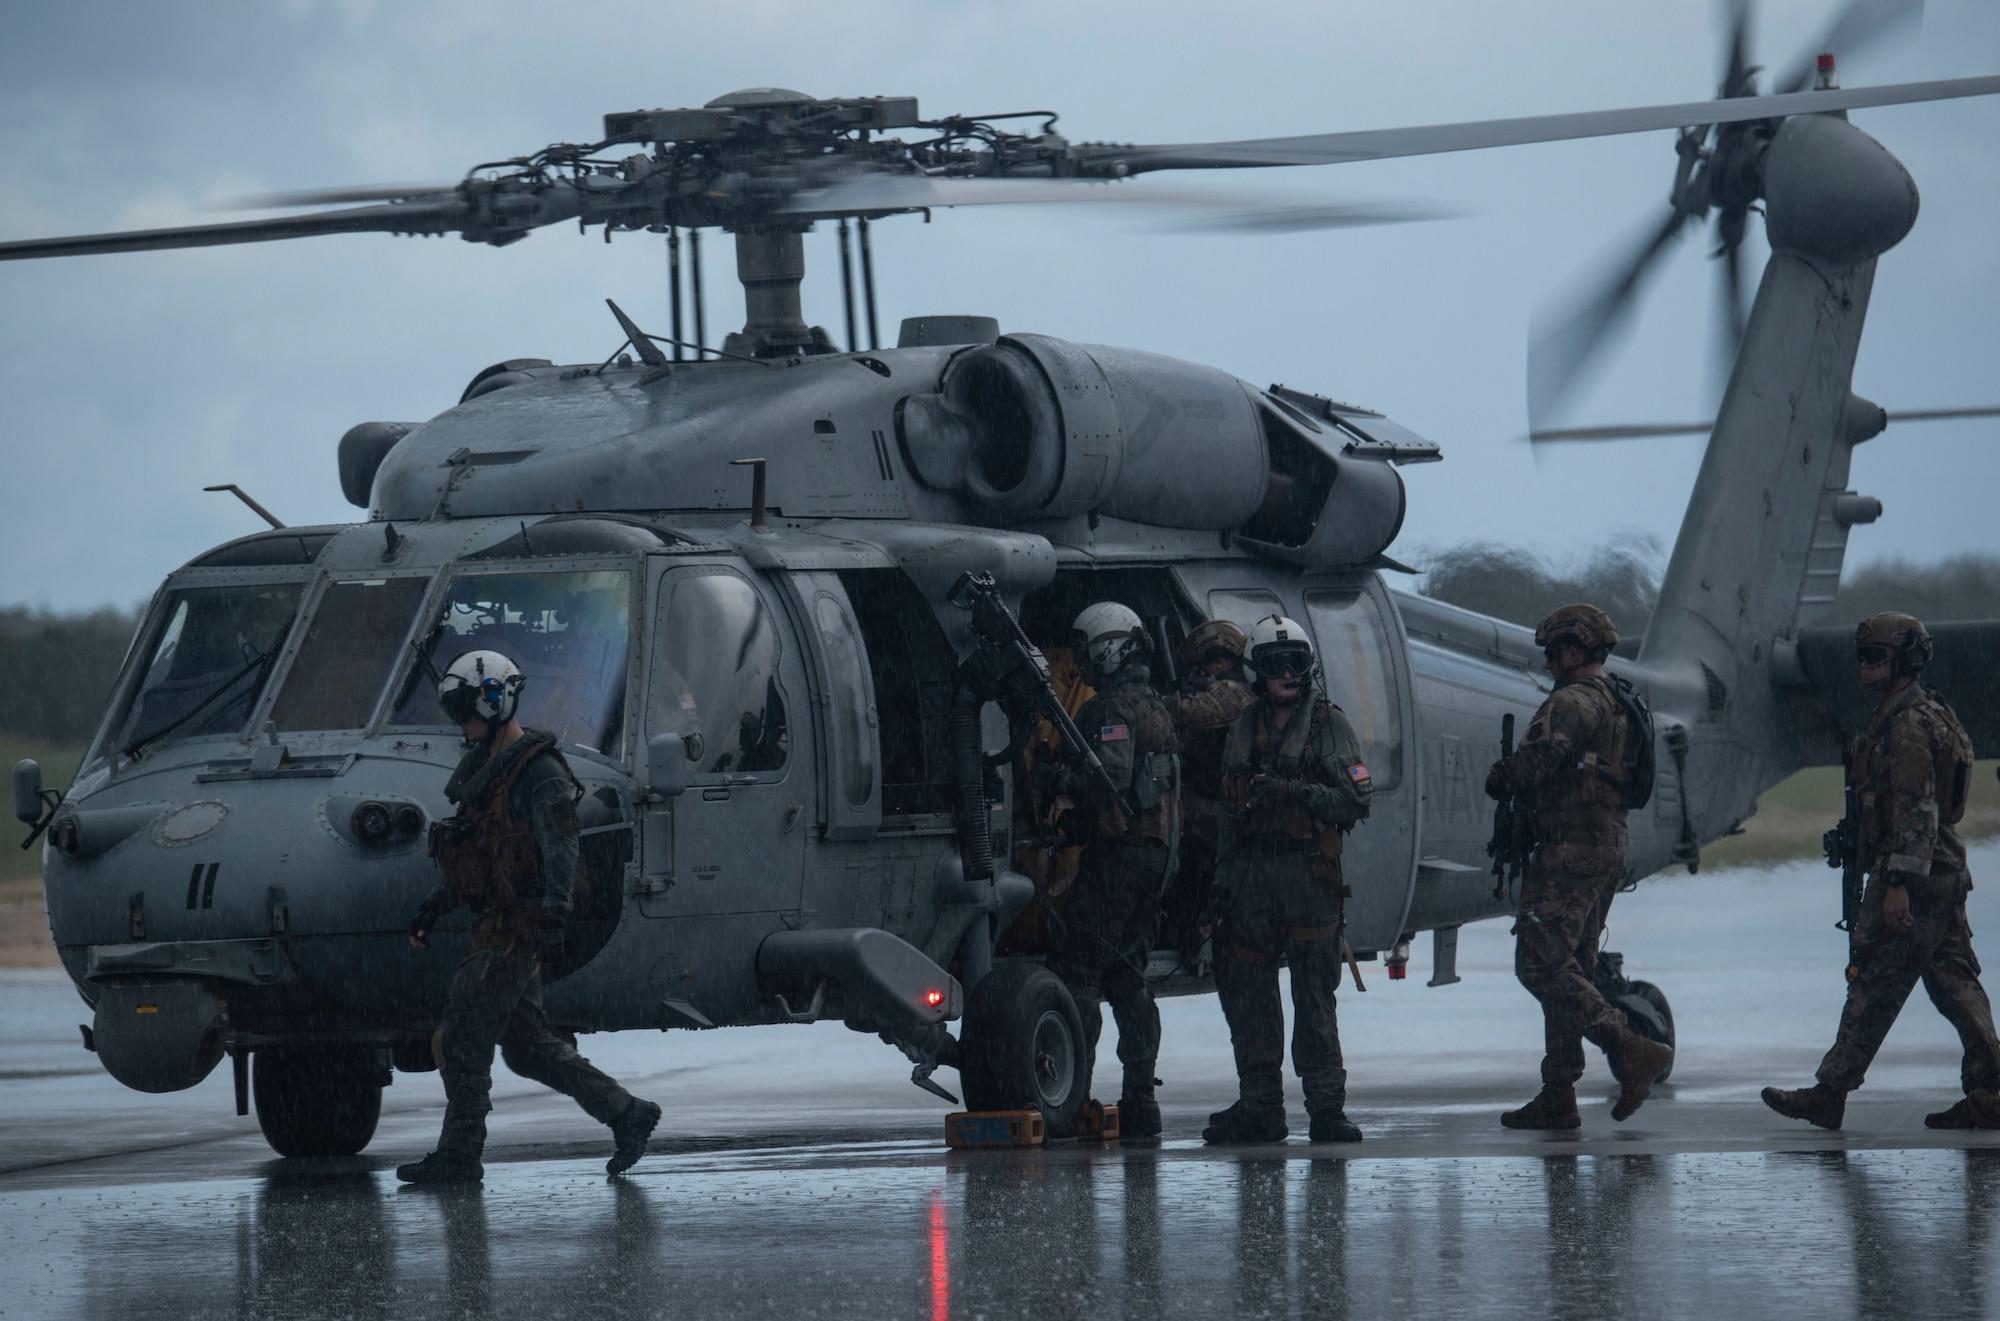 Airmen enter helicopter